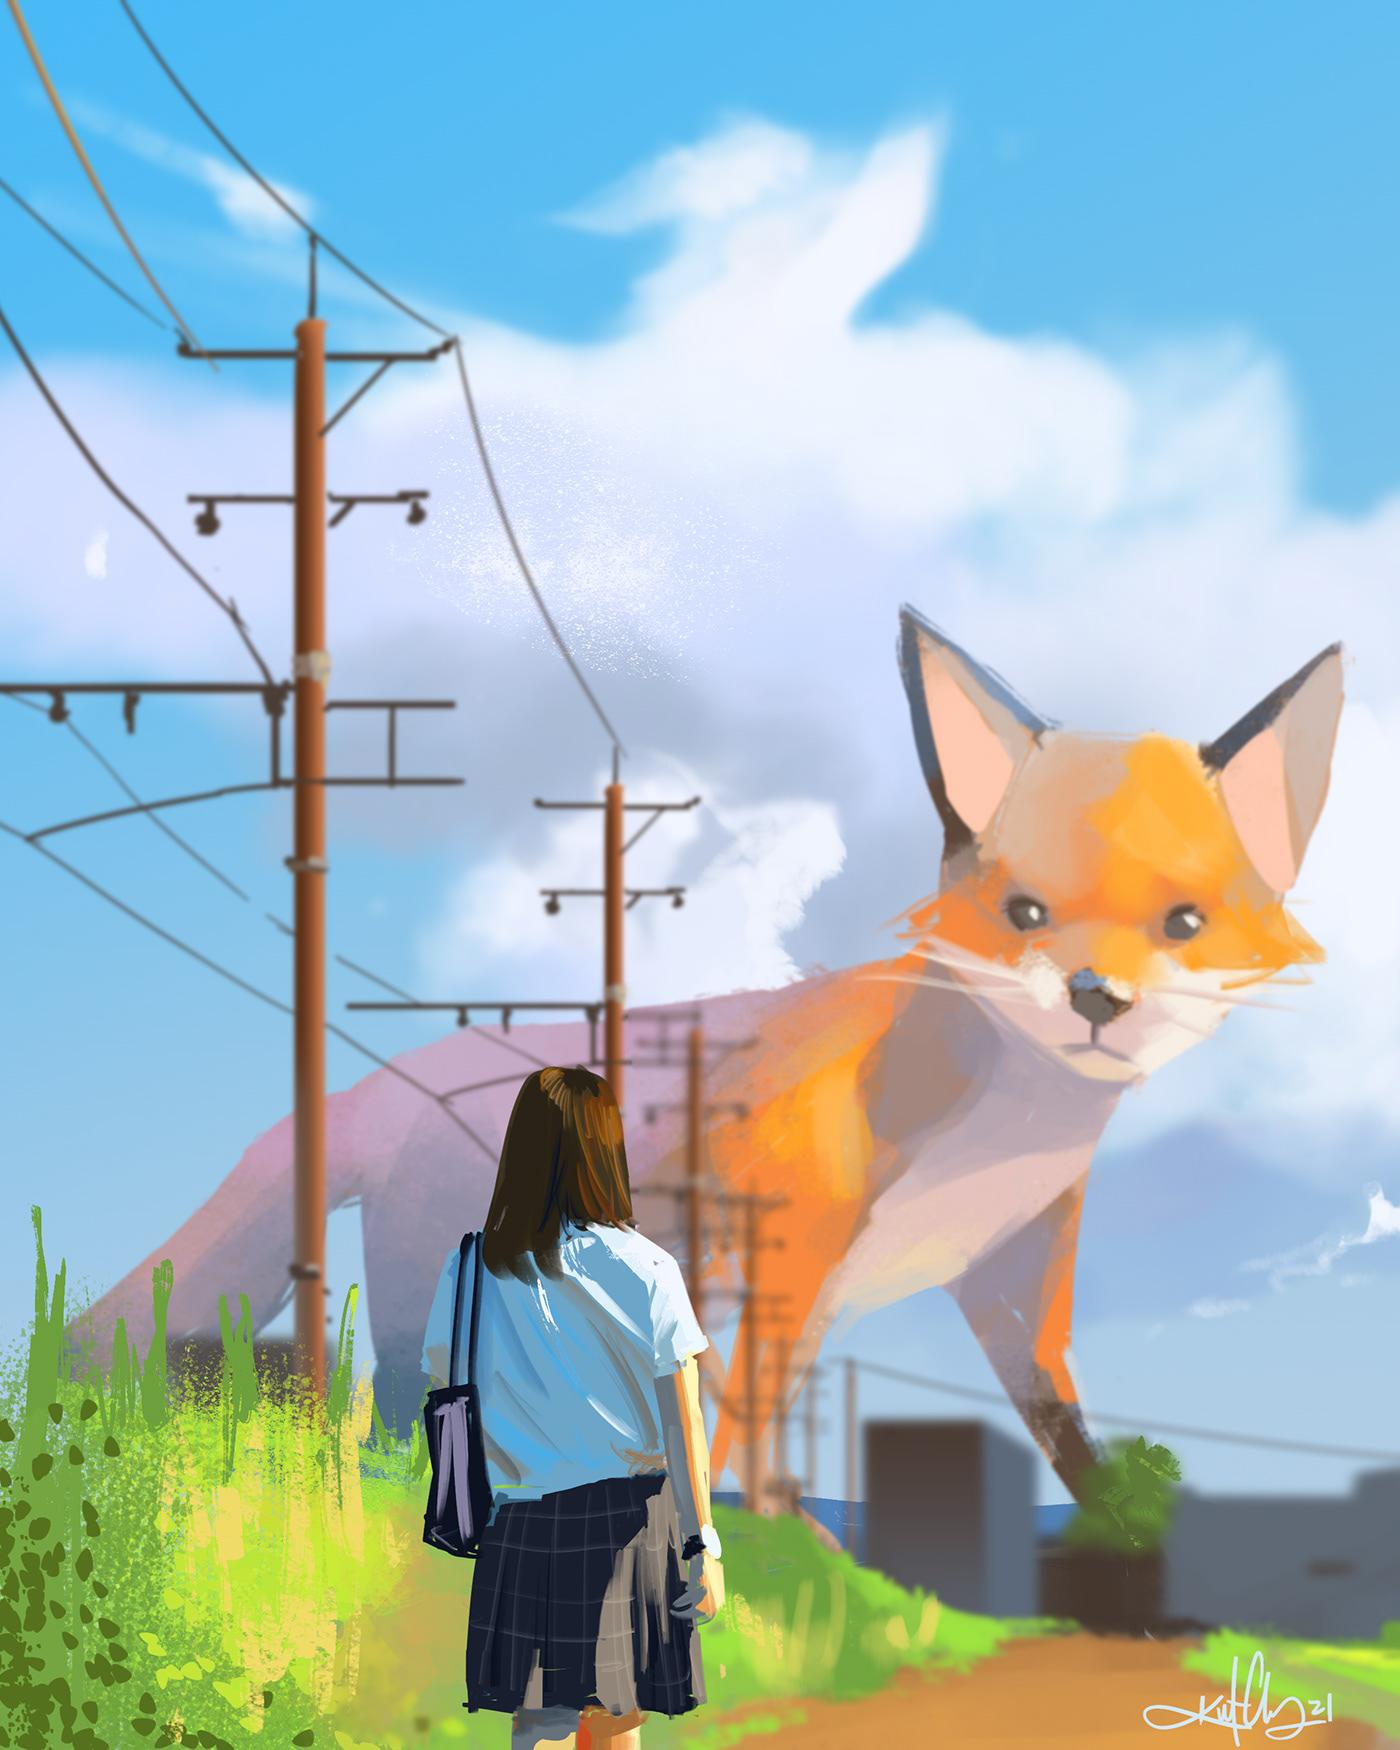 animal,Beautiful,cute,Daily Art,digital illustration,girl,kurt chang art,portraits,robot,Time Lapse